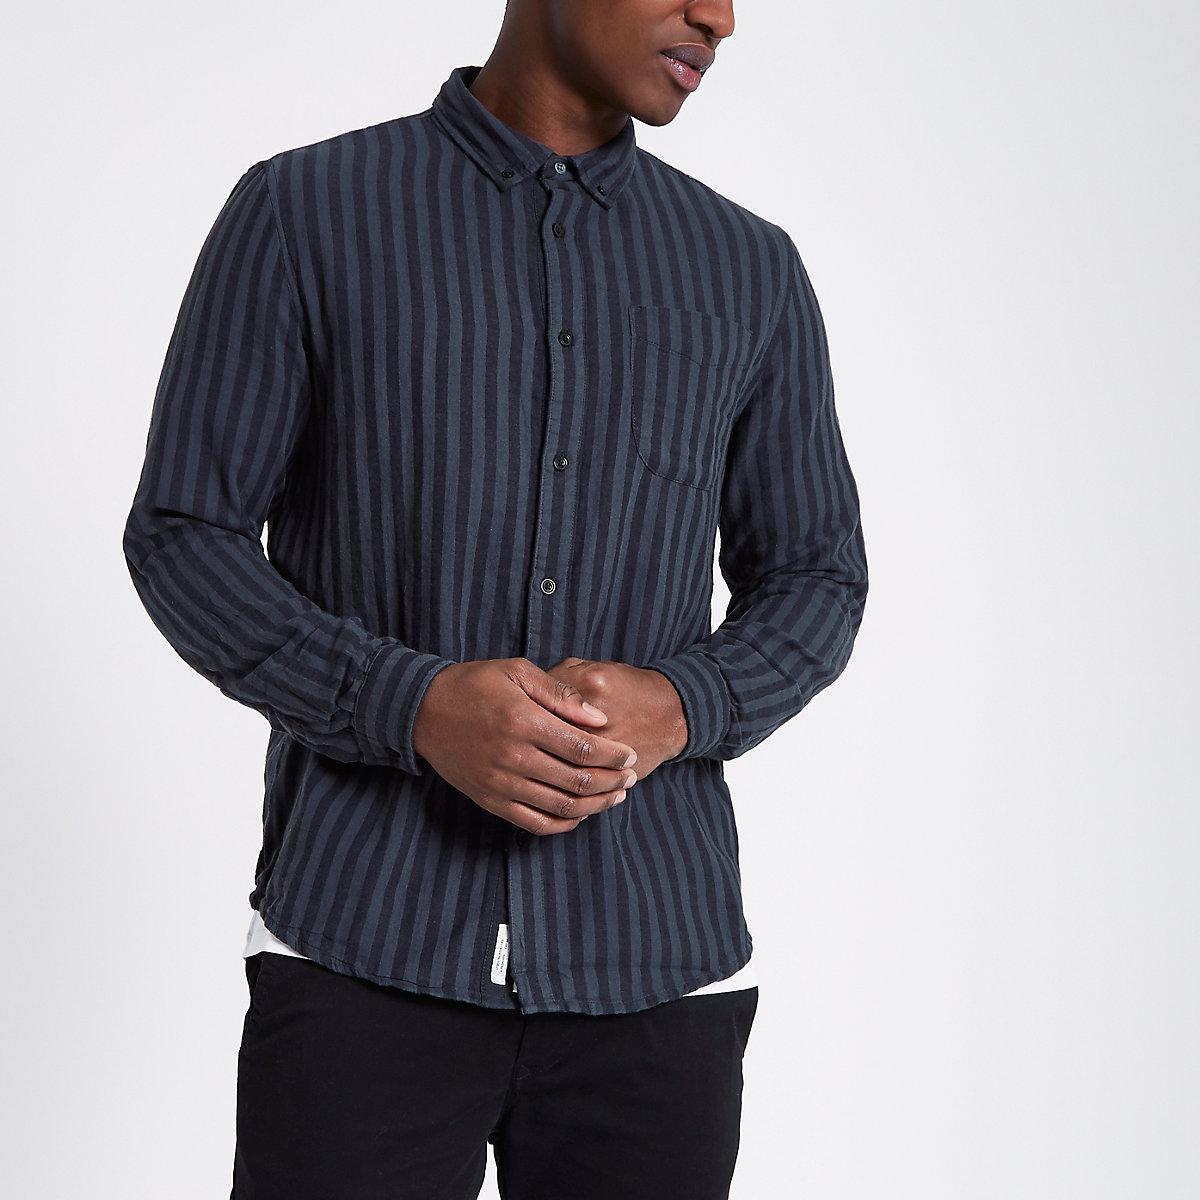 Black stripe long sleeve button-down shirt